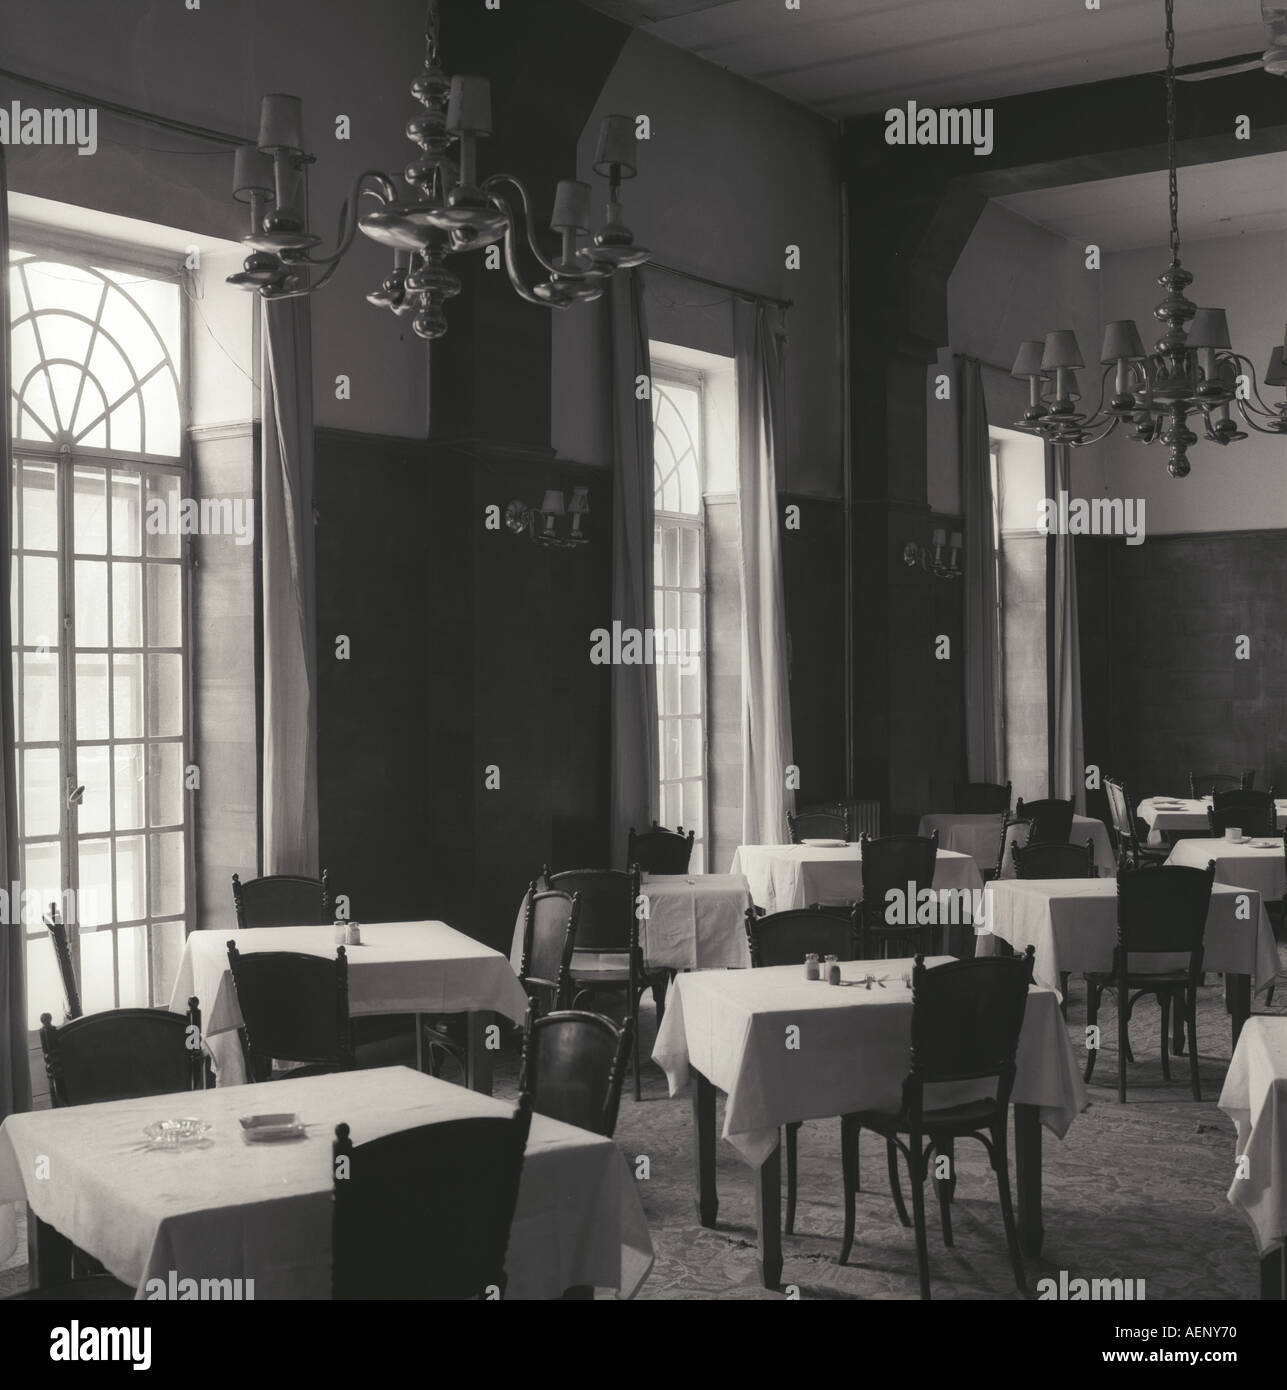 Dining Room Baron Hotel Aleppo Syria - Stock Image